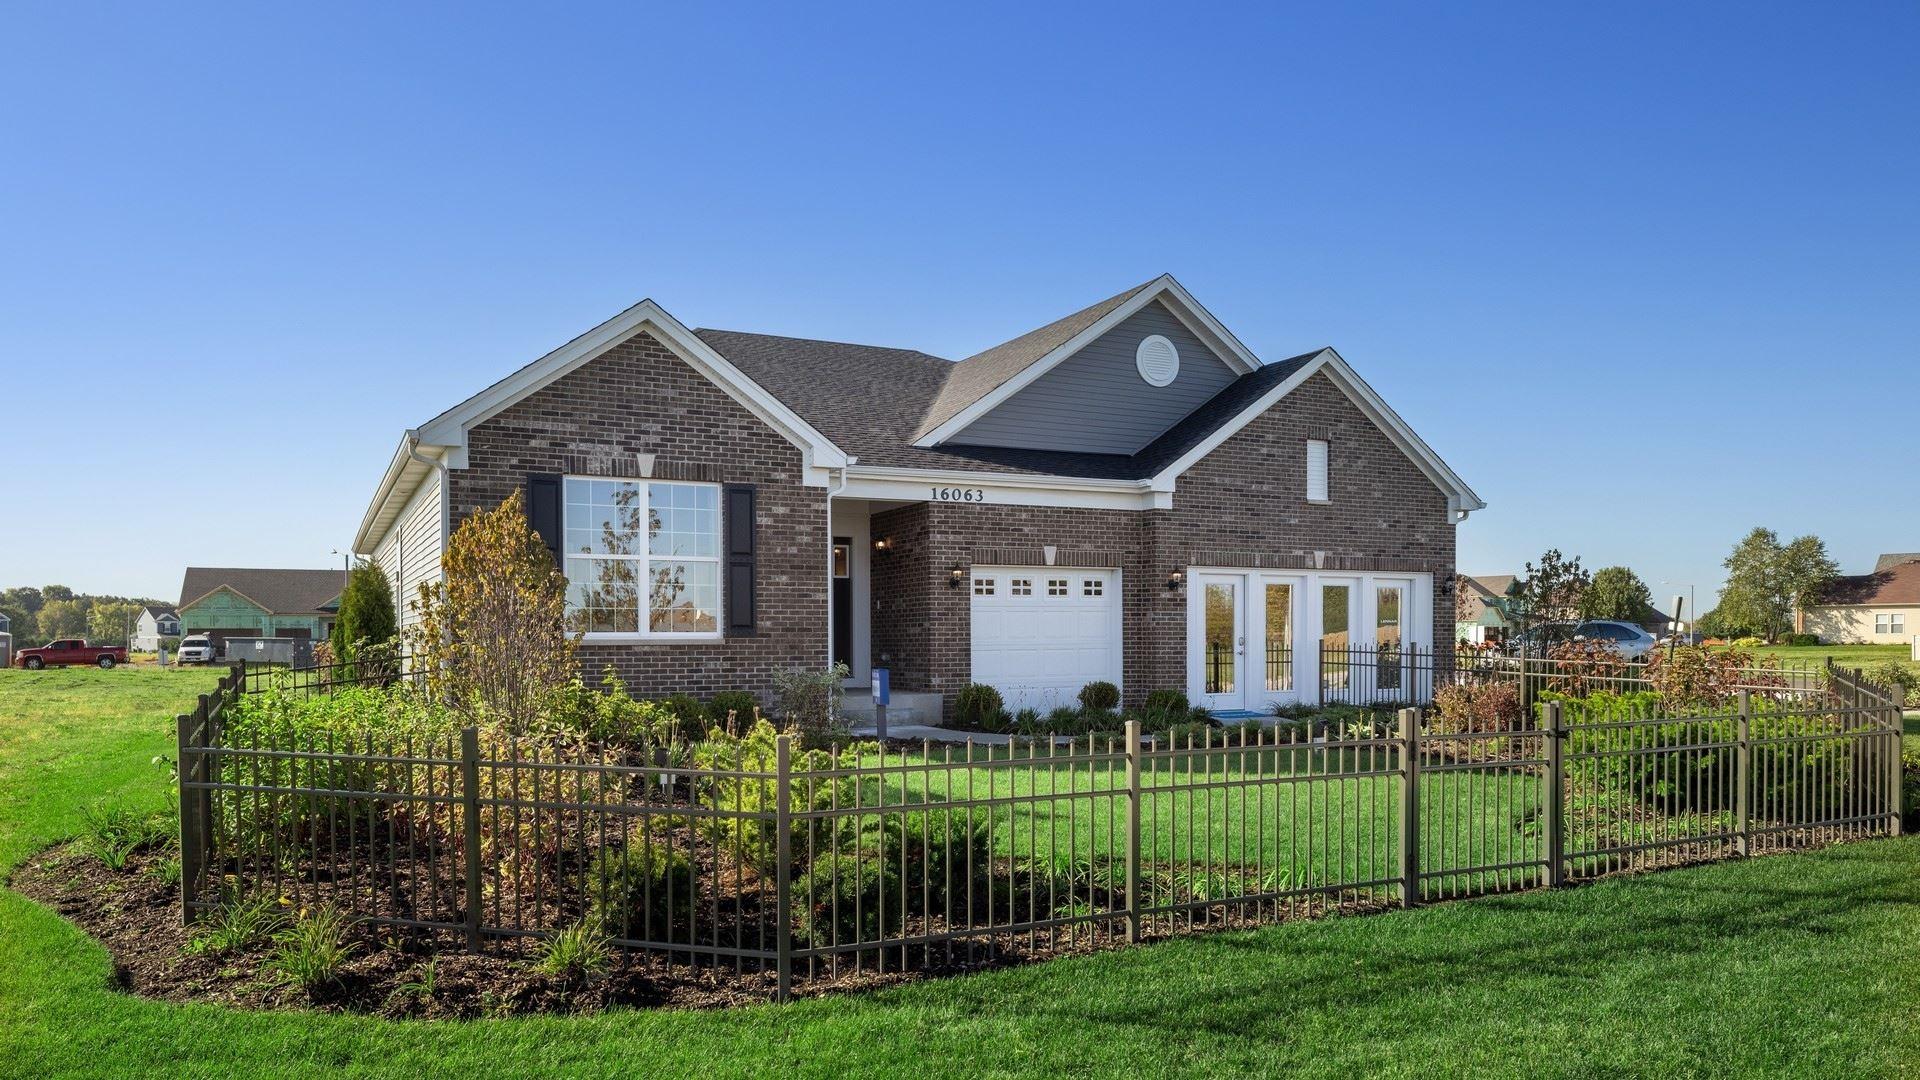 15939 S Selfridge Circle, Plainfield, IL 60586 - #: 10673225